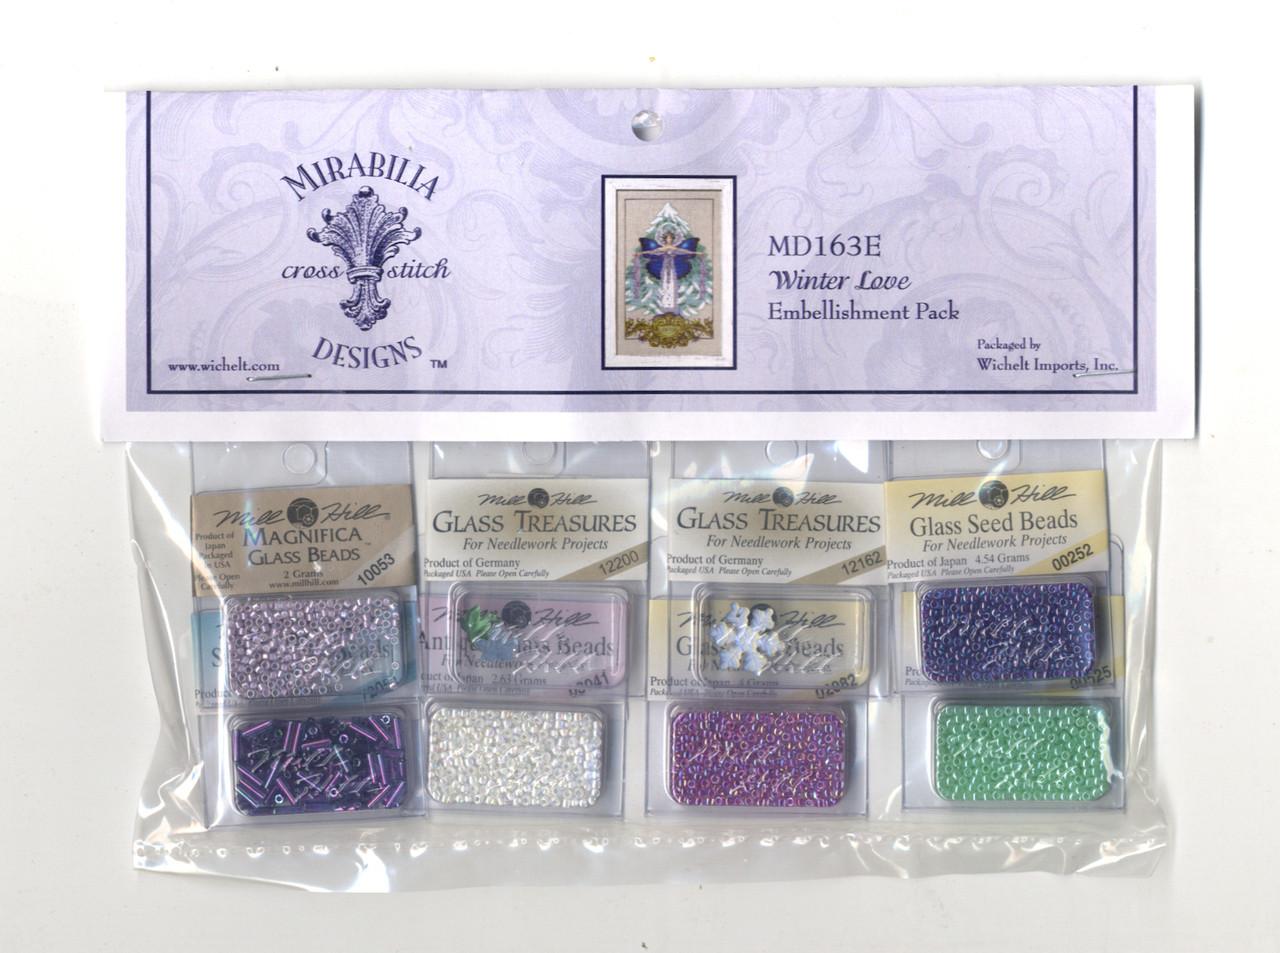 Mirabilia Embellishment Pack  - Winter Love